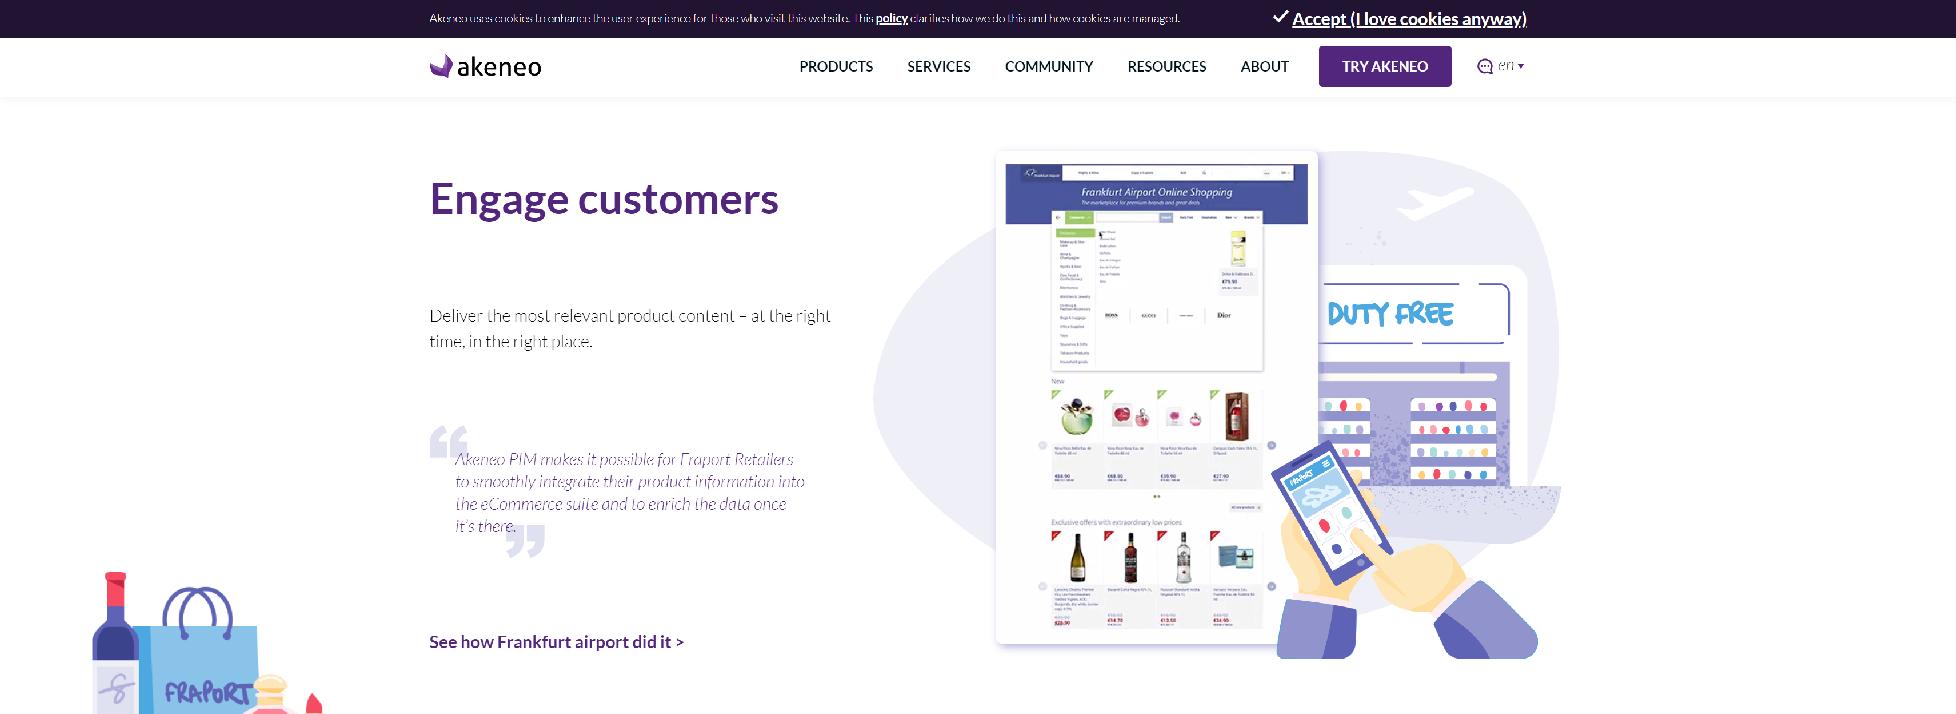 Top 15 Best Product Information Management (PIM) Software